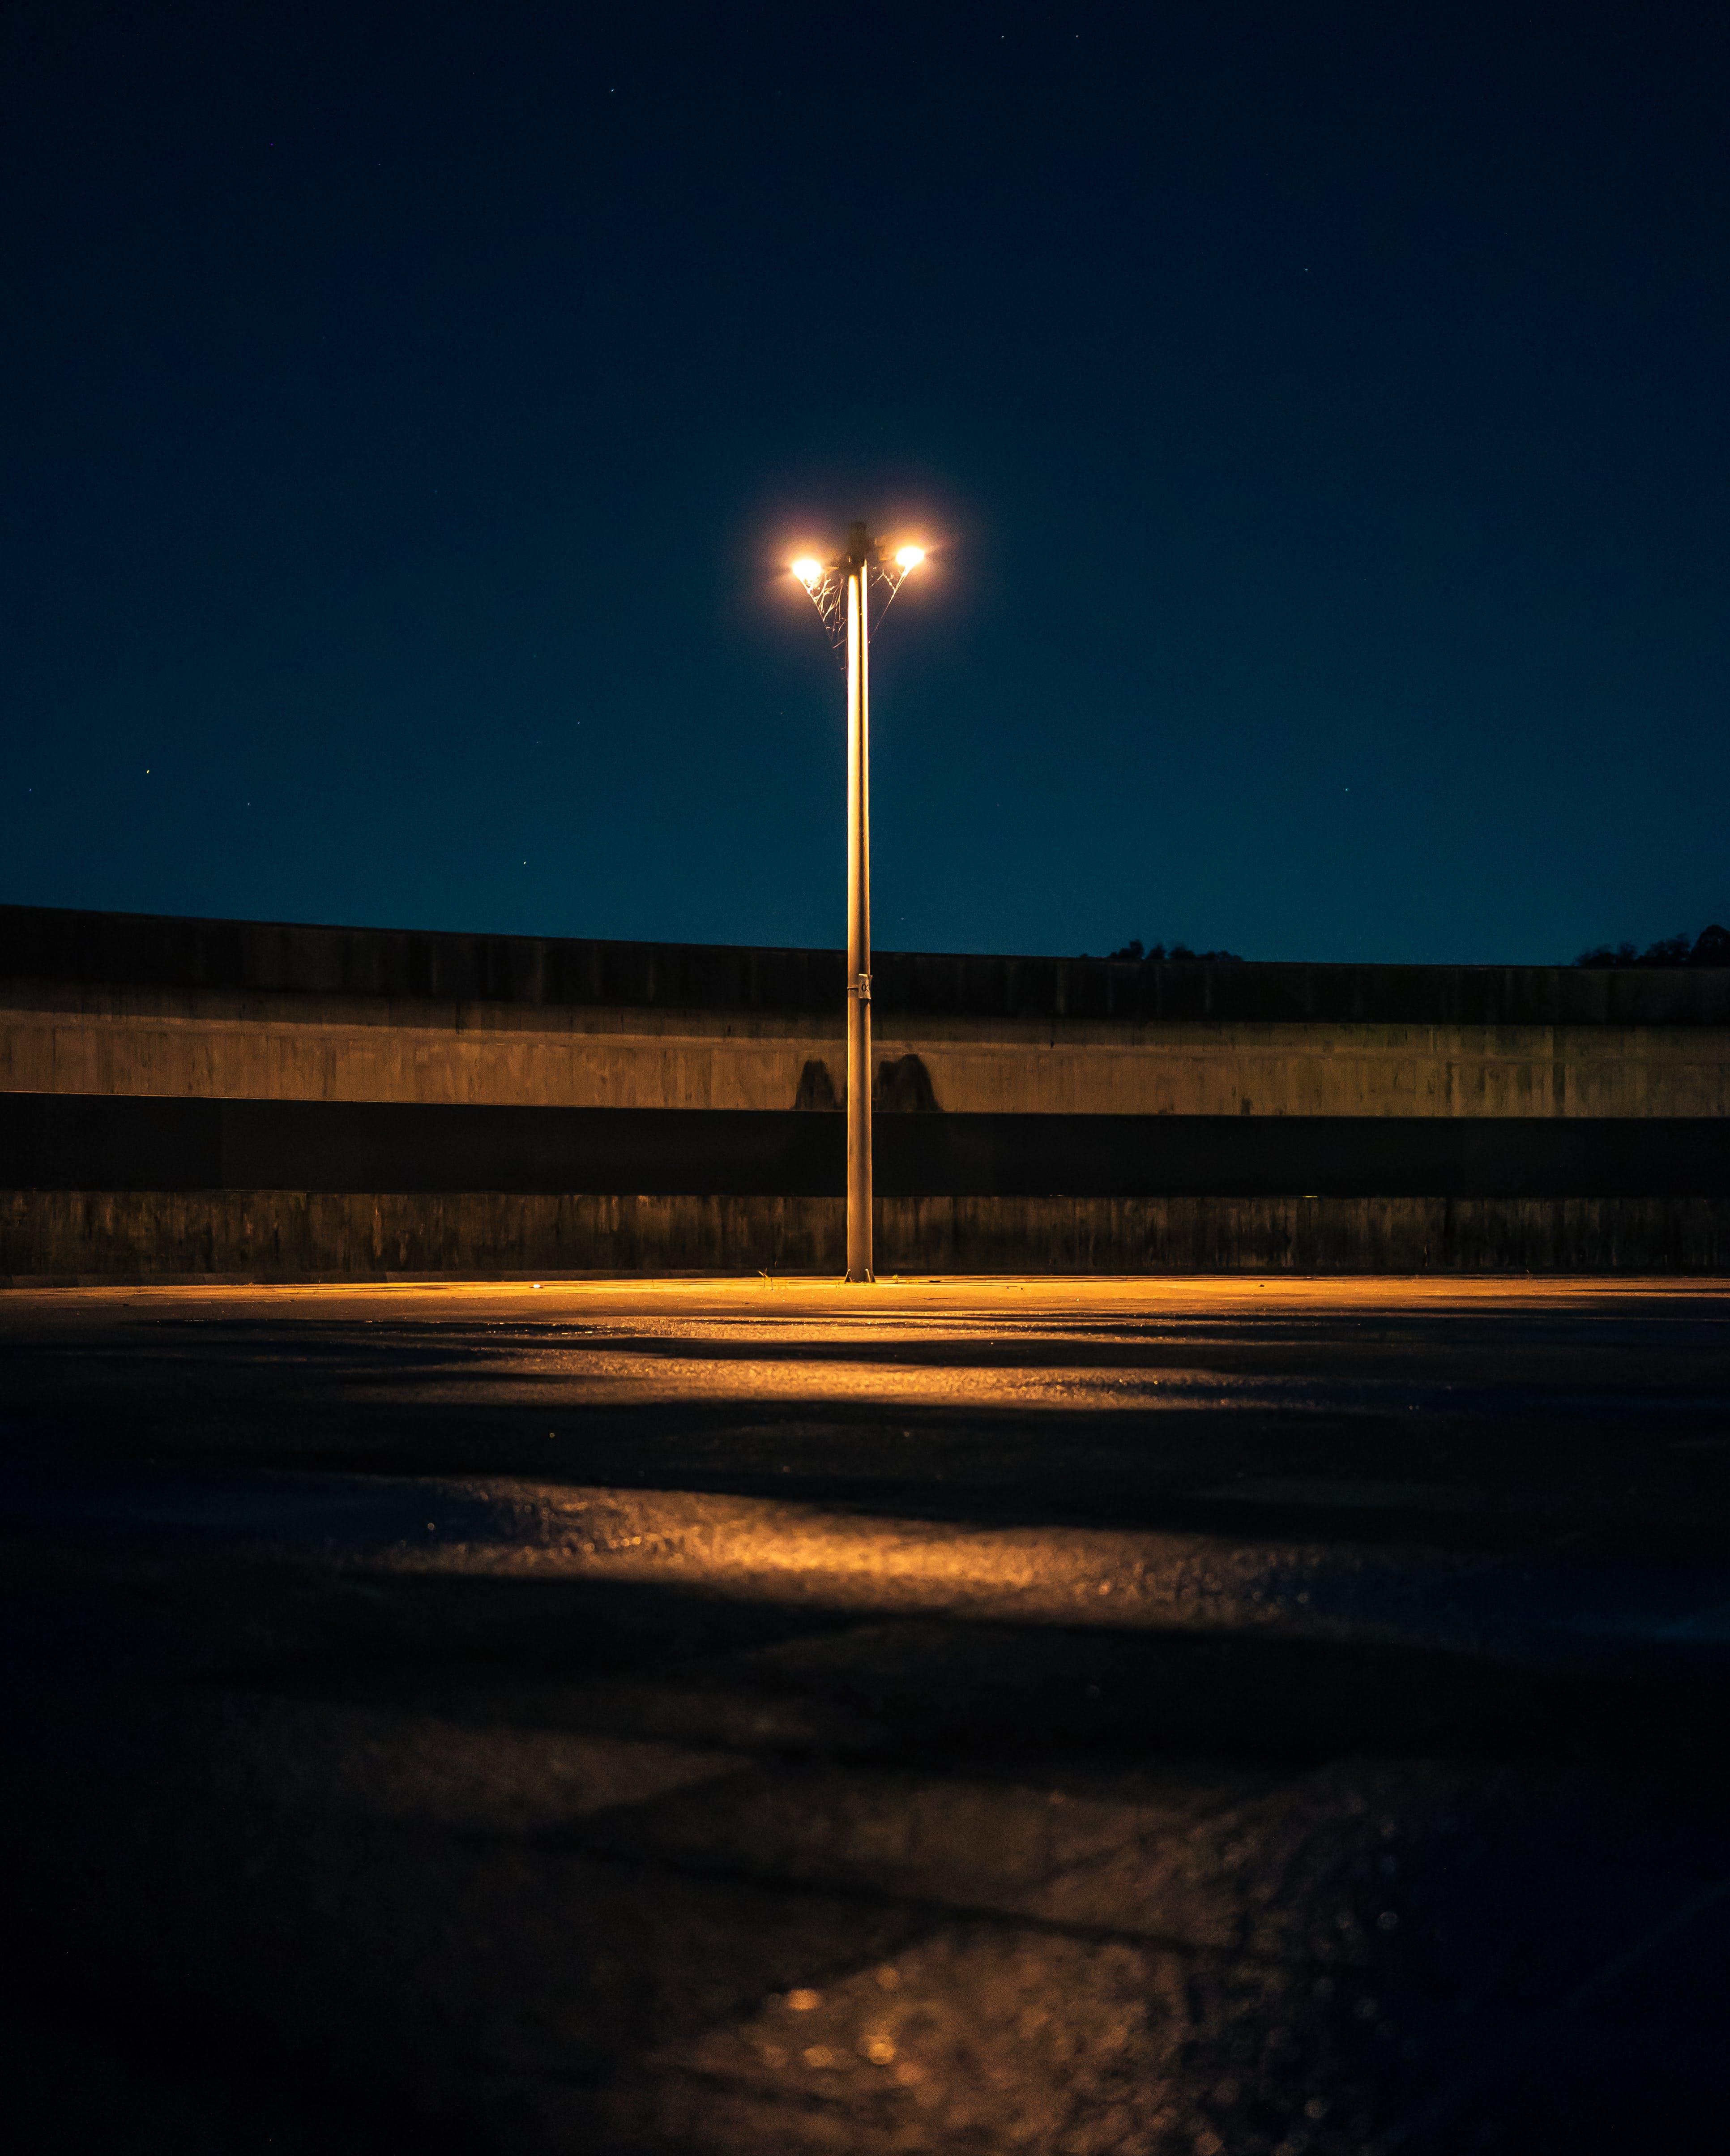 Street Light during Nighttime